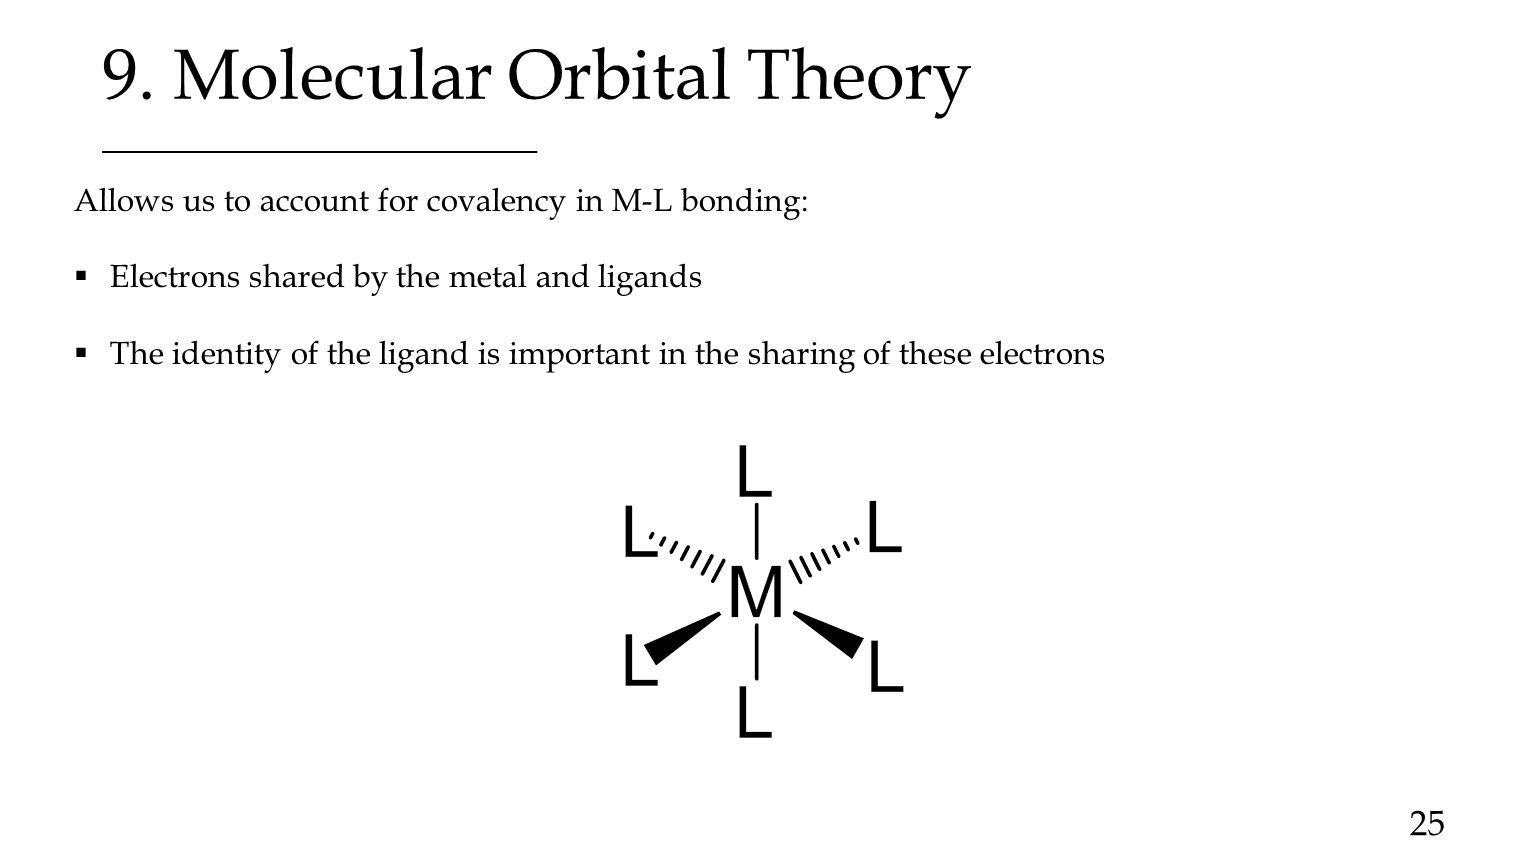 cn molecular orbital diagram thermistor symbol electrical coordination chemistry ppt video online download